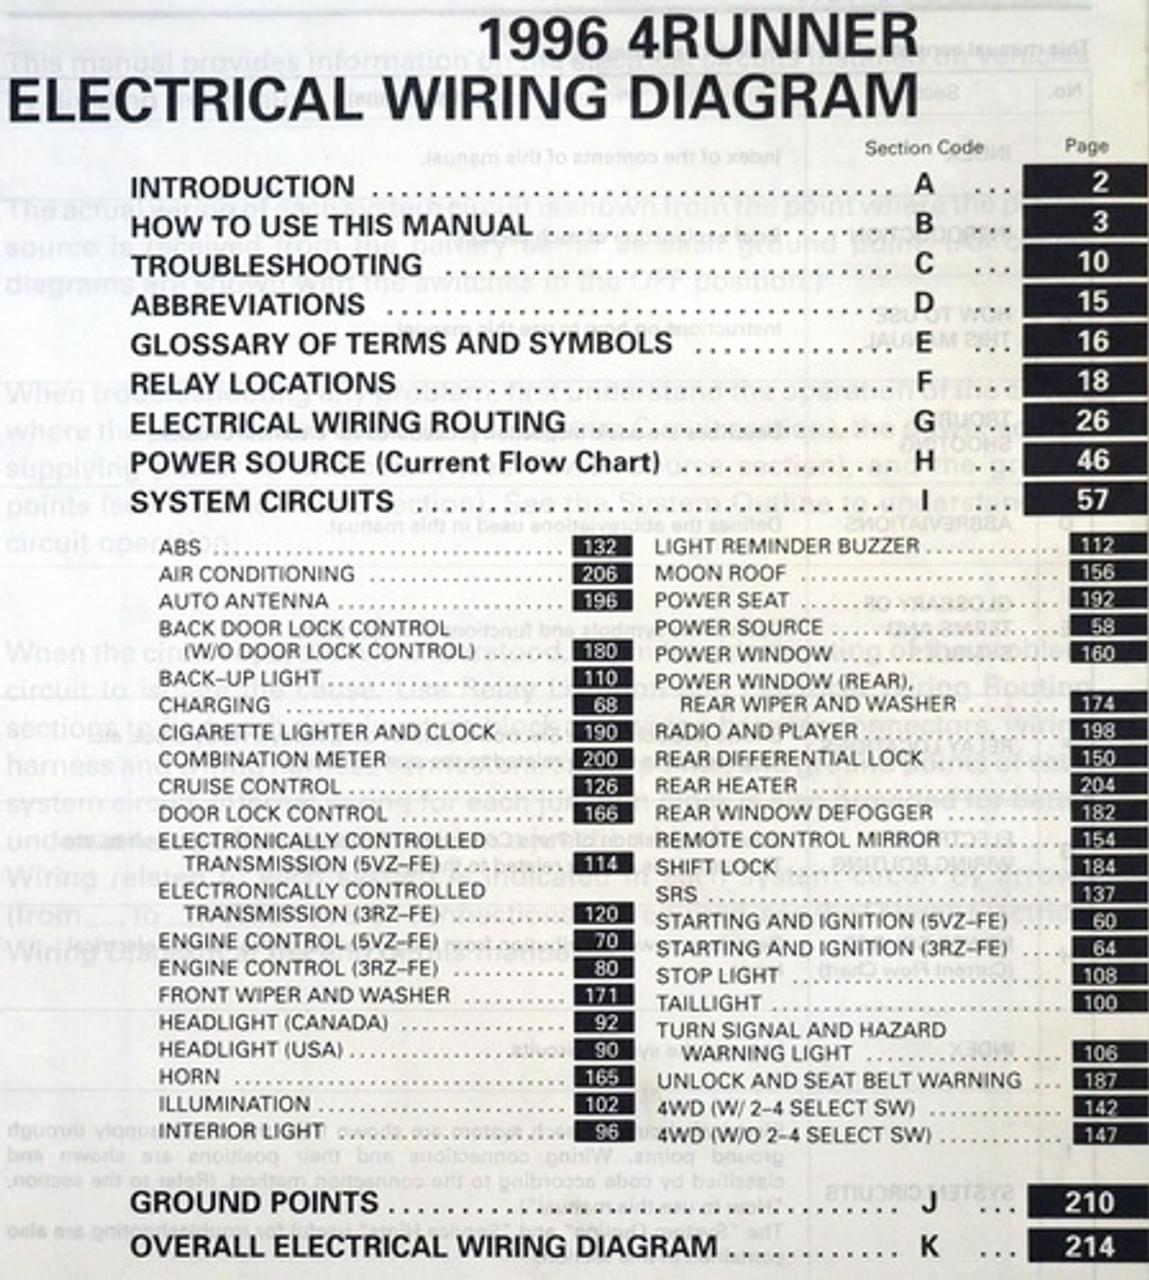 1996 Toyota 4Runner Electrical Wiring Diagrams Original ...